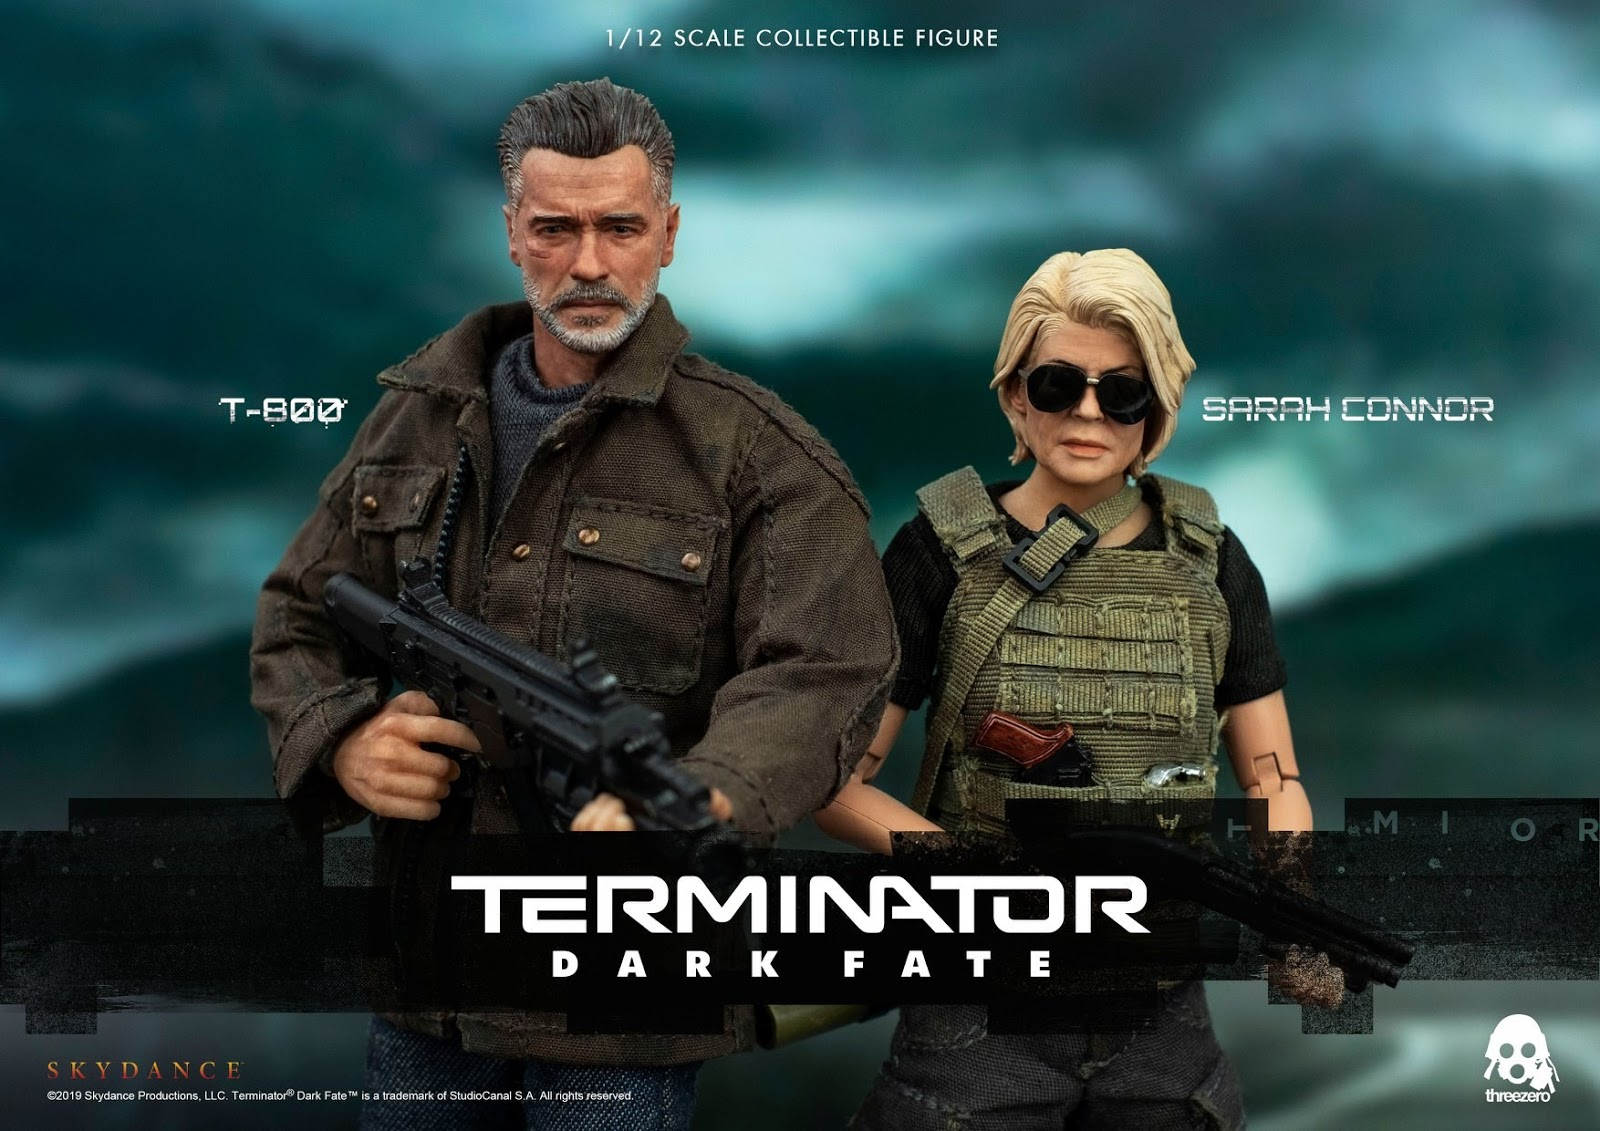 ThreeZero《未來戰士:黑暗命運》阿諾T800.莎拉康納 1/12人偶 - Toys Zone D 玩具兄弟 -Figures Price List. Reviews